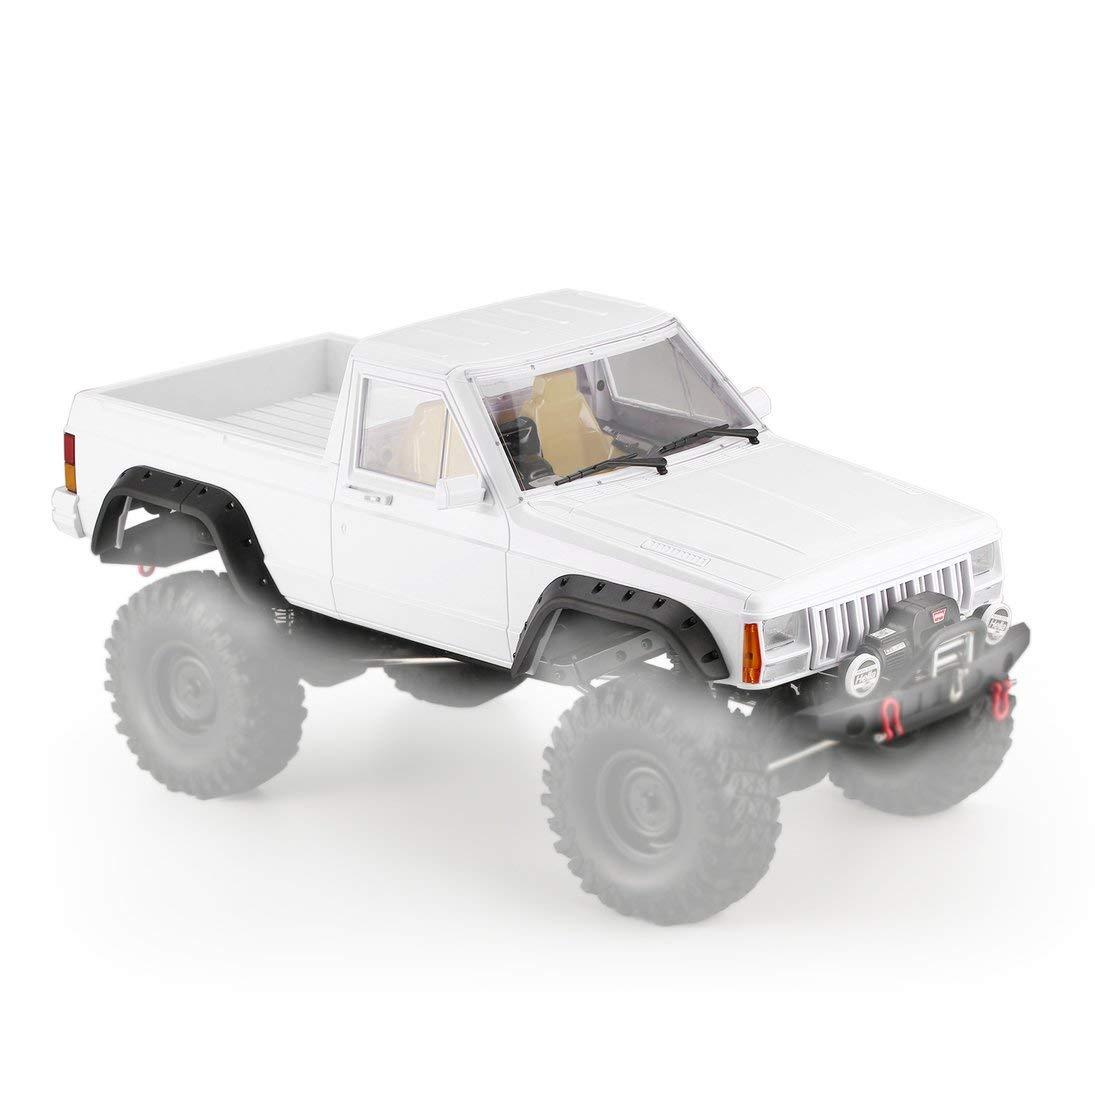 AX-313B Pickup per carrozzeria da 313mm Kit Fai da Te per Axial SCX10 RC4WD RC Crawler ToGames-IT